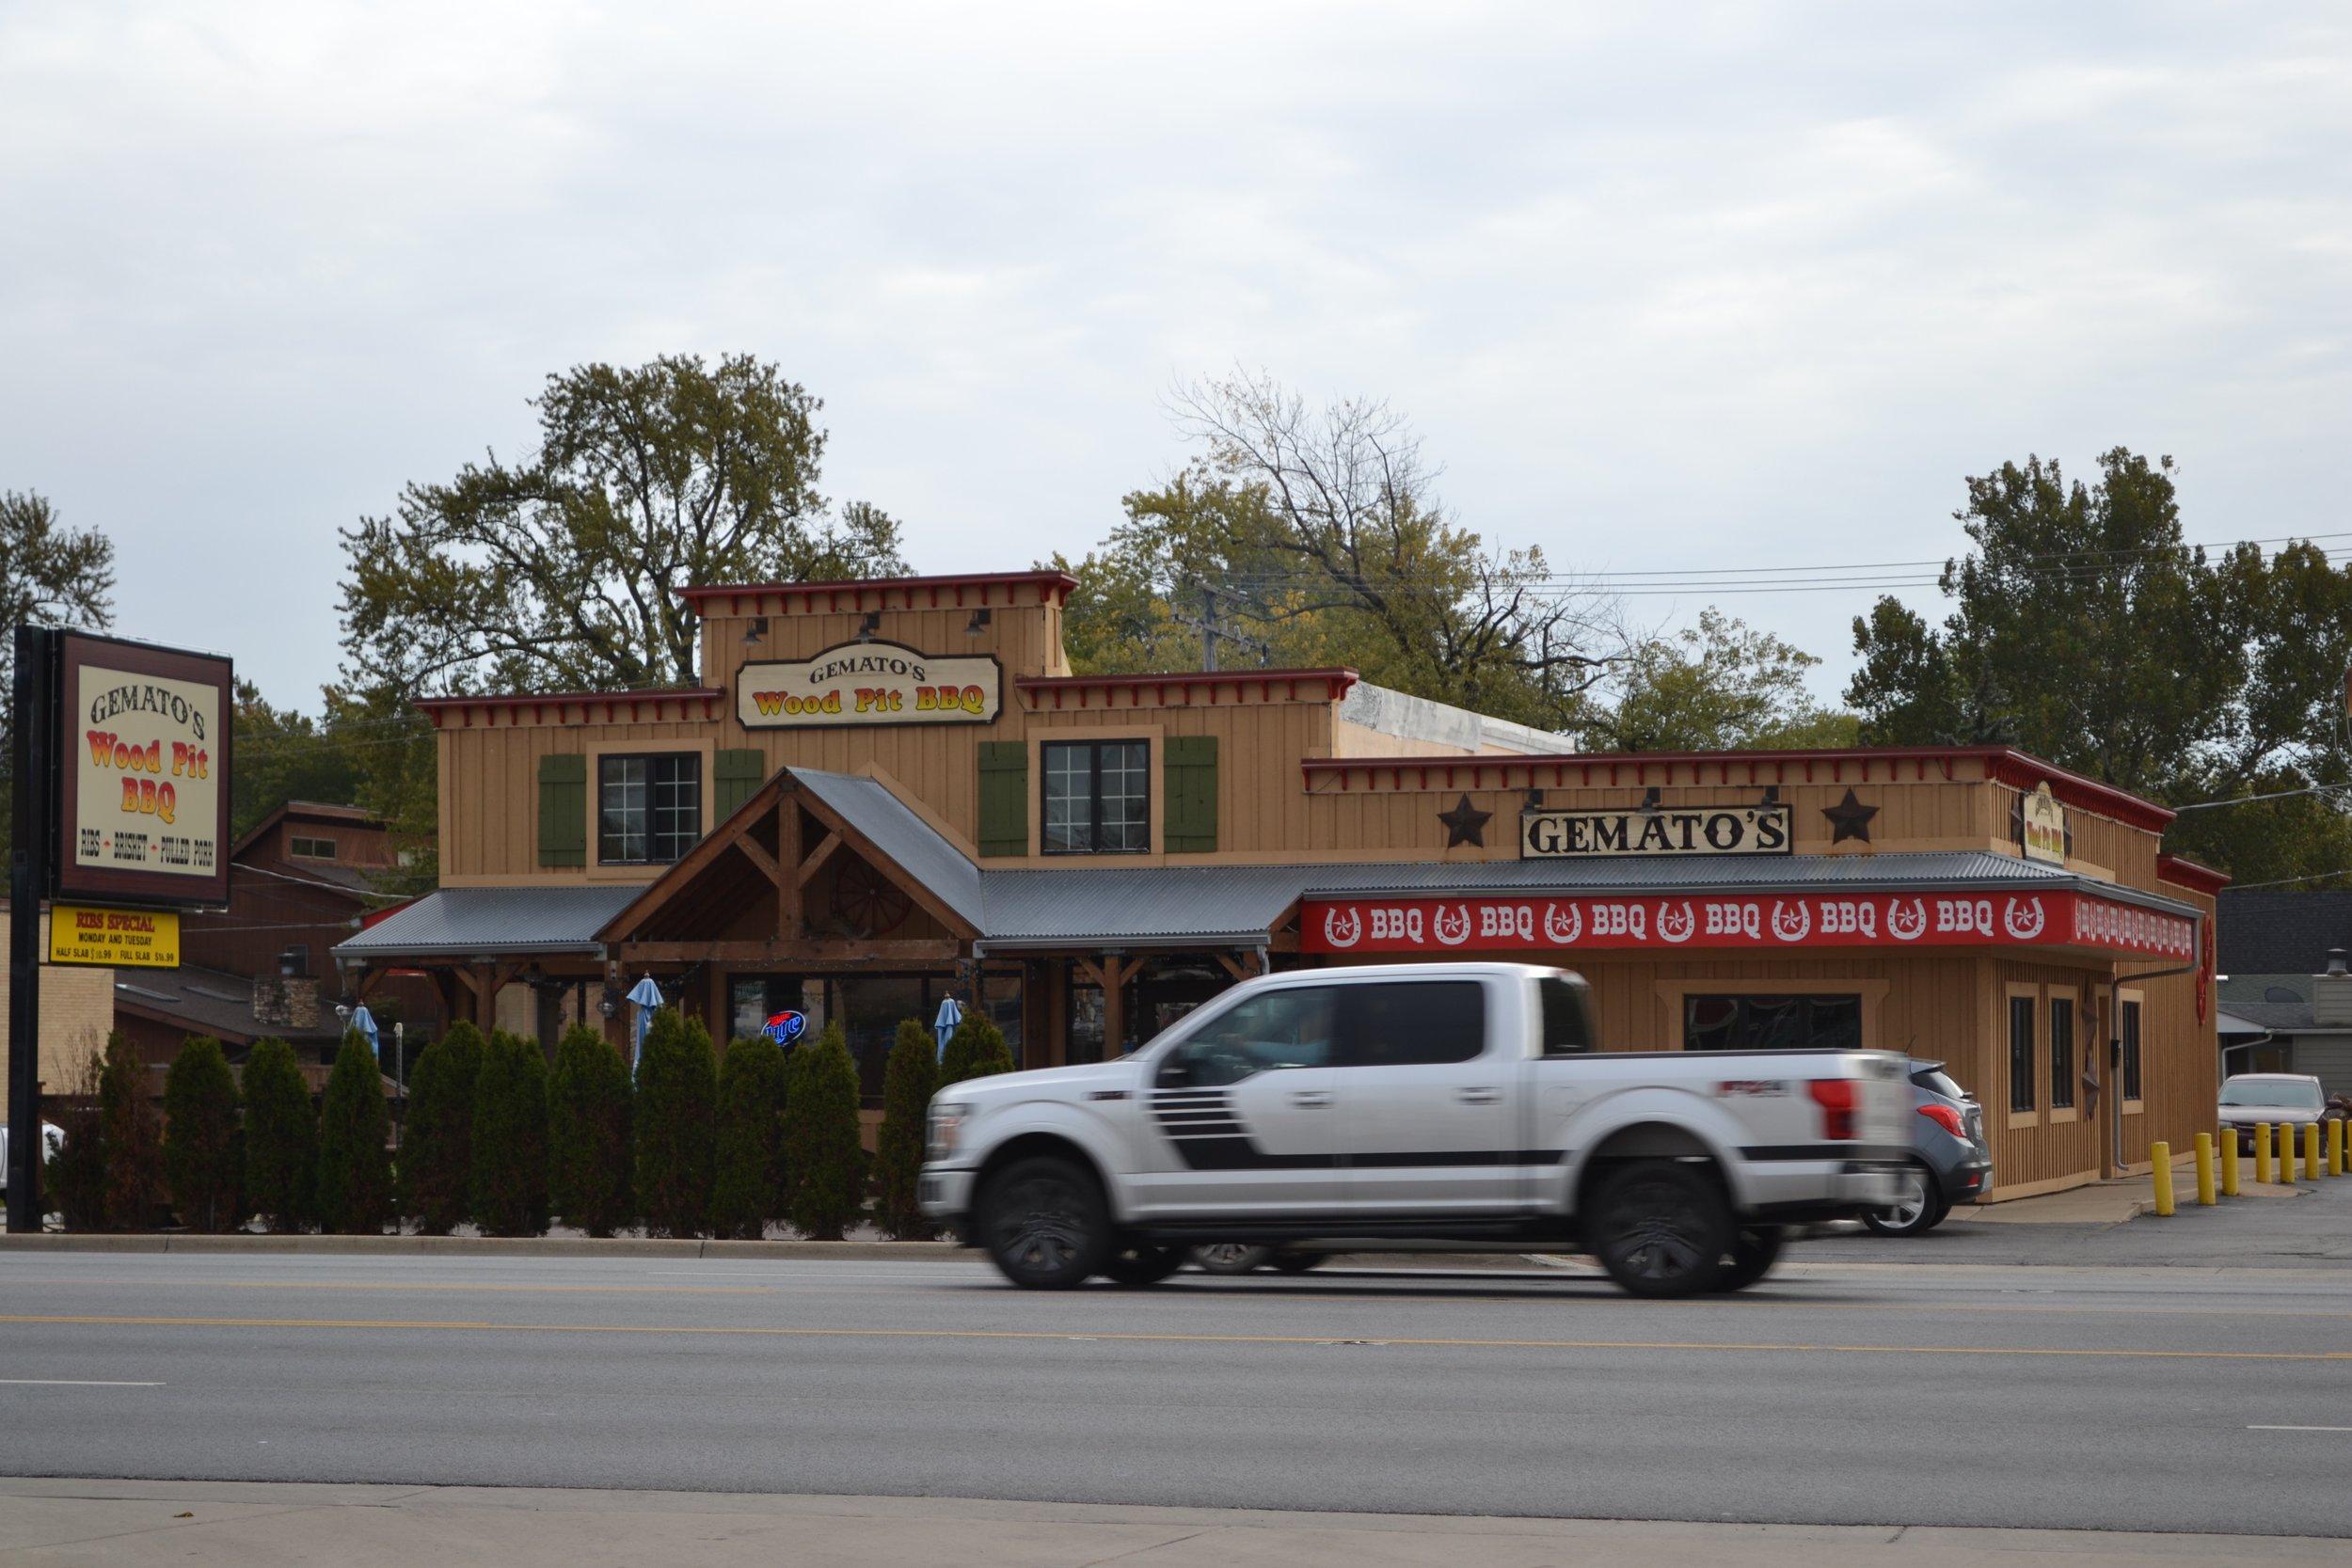 GematosWood Pit BBQ, Naperville, IL